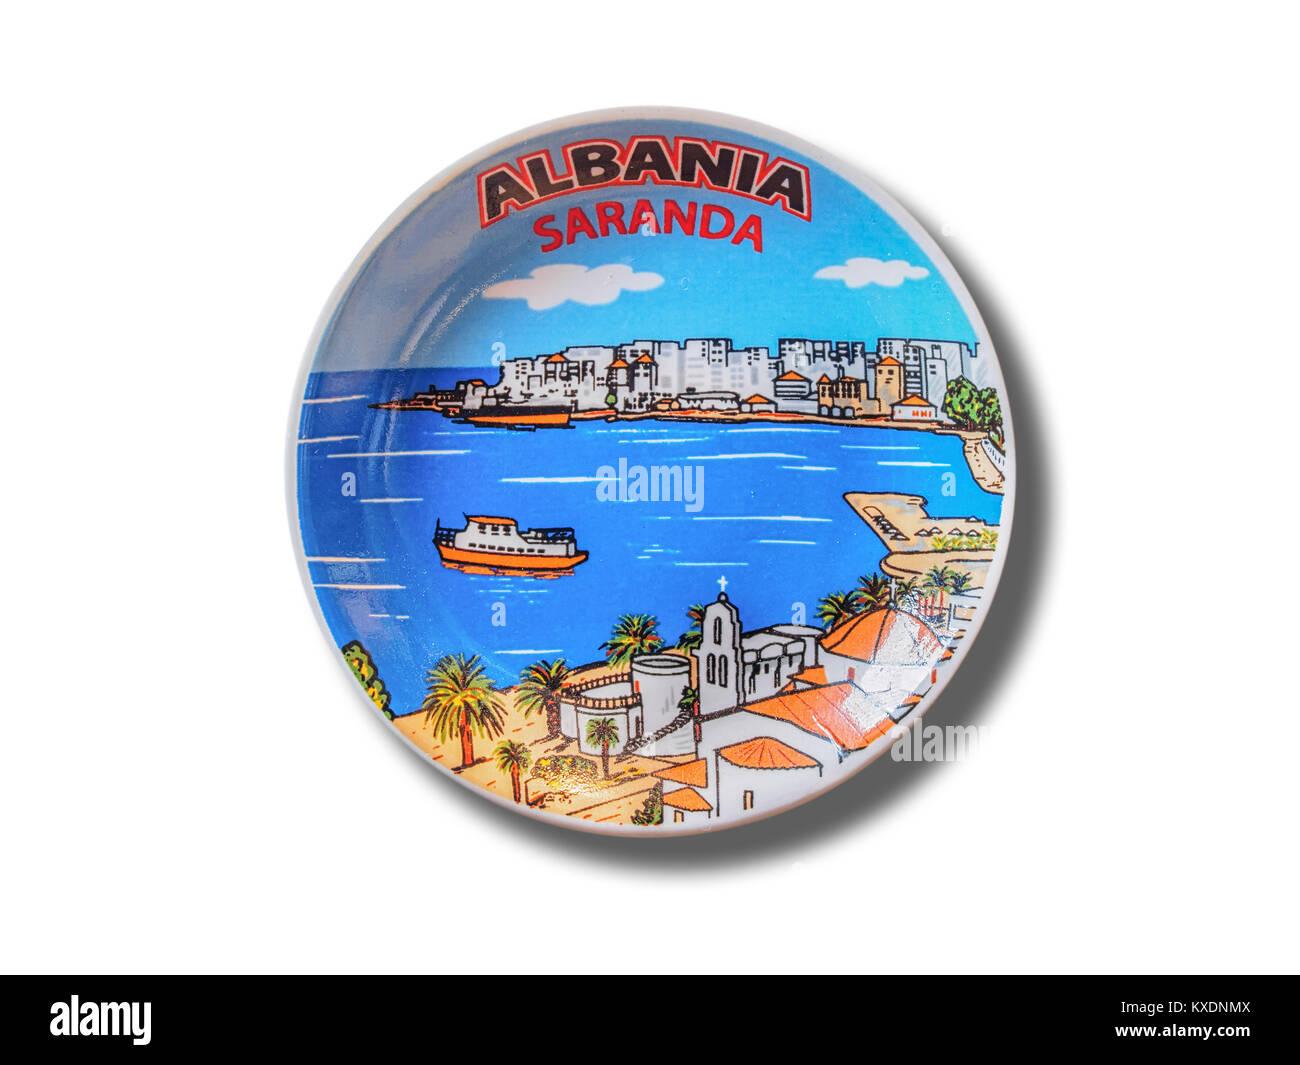 Saranda (Albania) souvenir refrigerator magnet isolated on white background - Stock Image